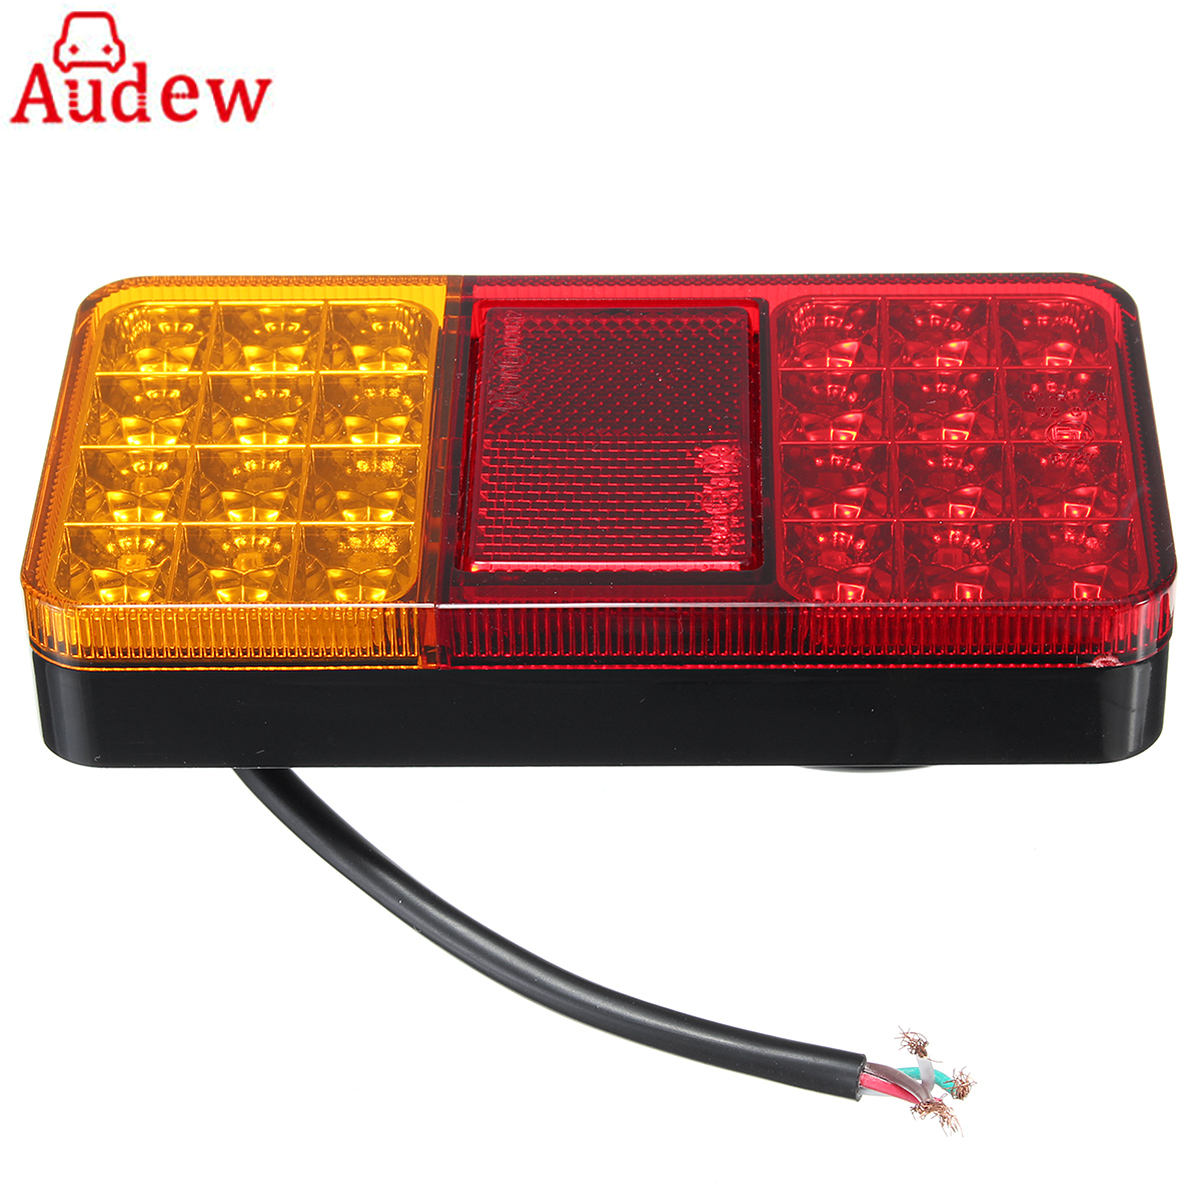 24LED 12V Trailer Truck Rear Lights Brake Stop Tail Turn Indicator LED Lamps For Car Trailers